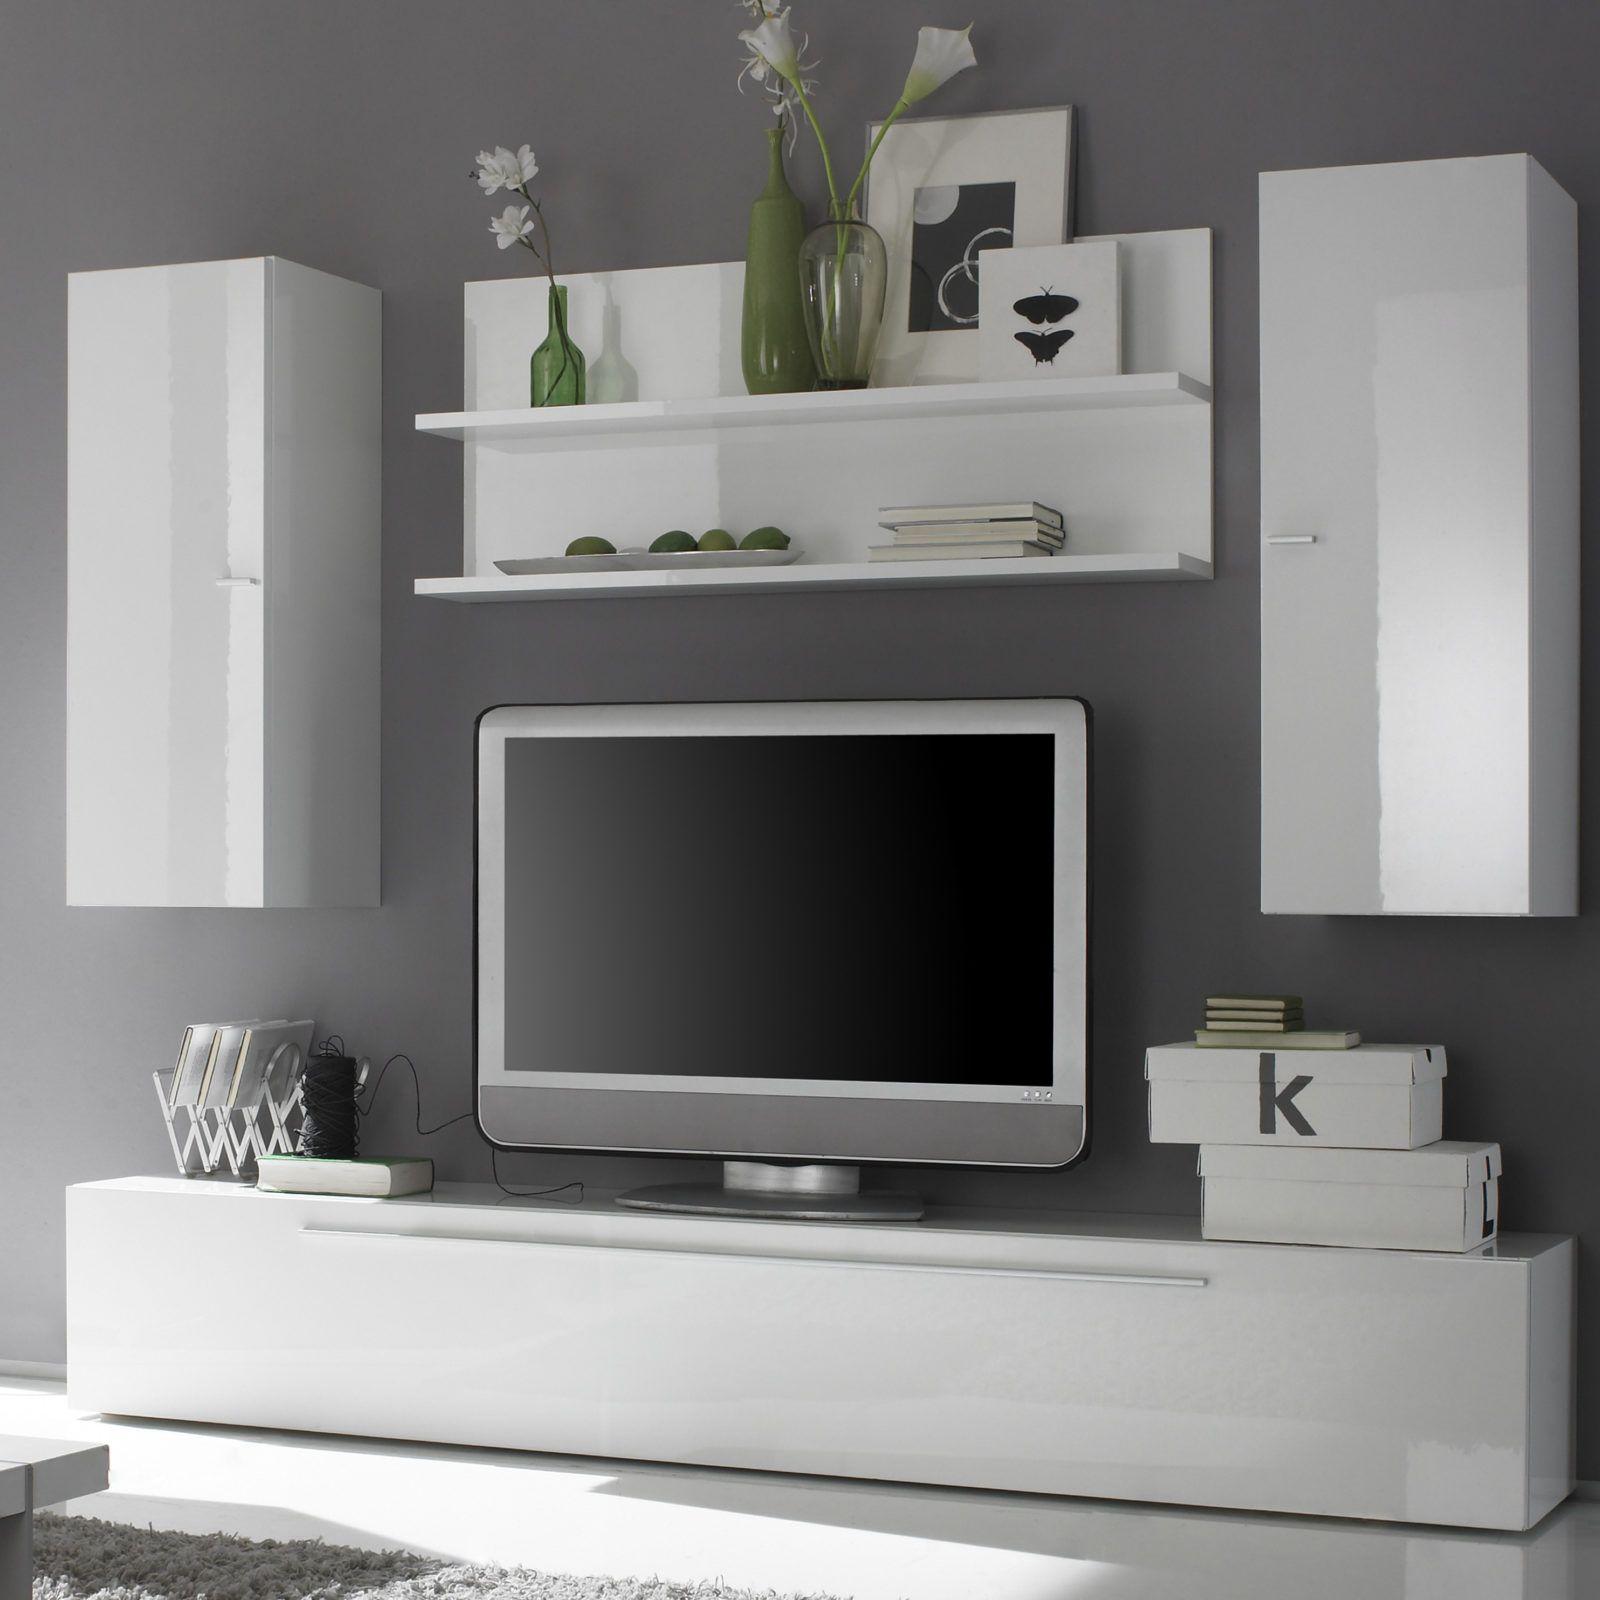 Simple Entertainment Centre Furniture Design Simple Furniture